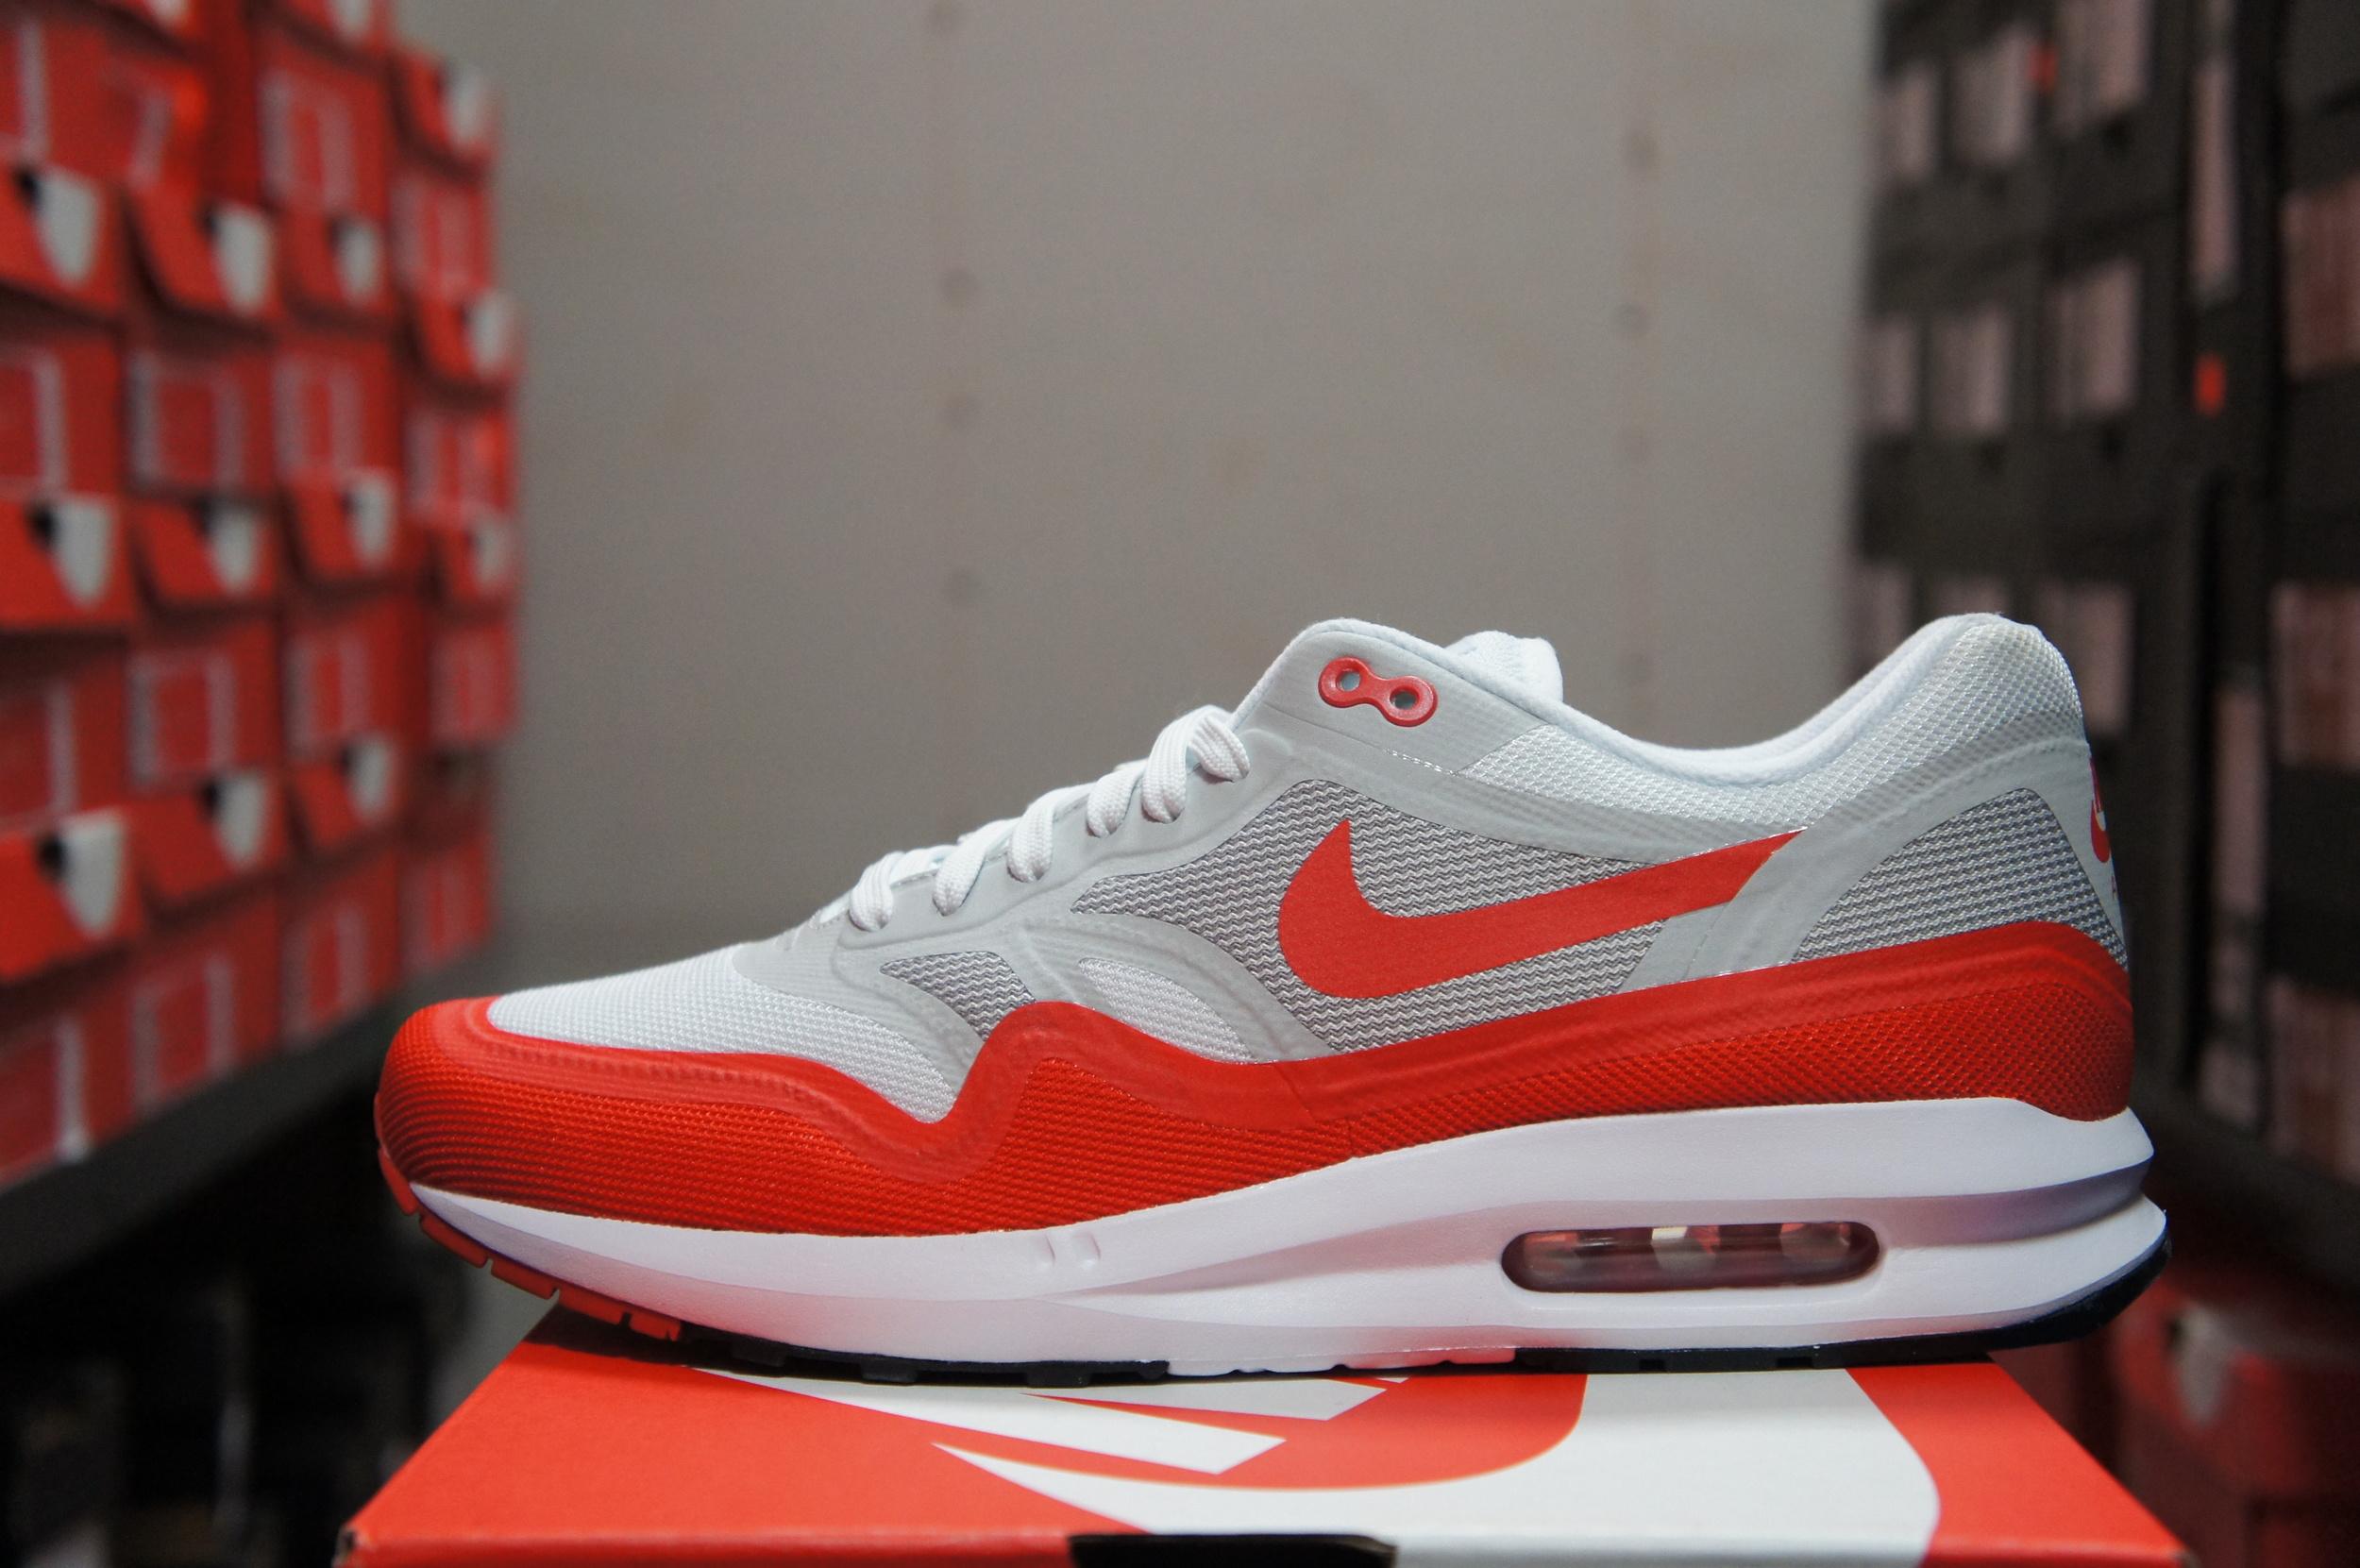 united states cheap sale online store Nike Air Max Lunar 1